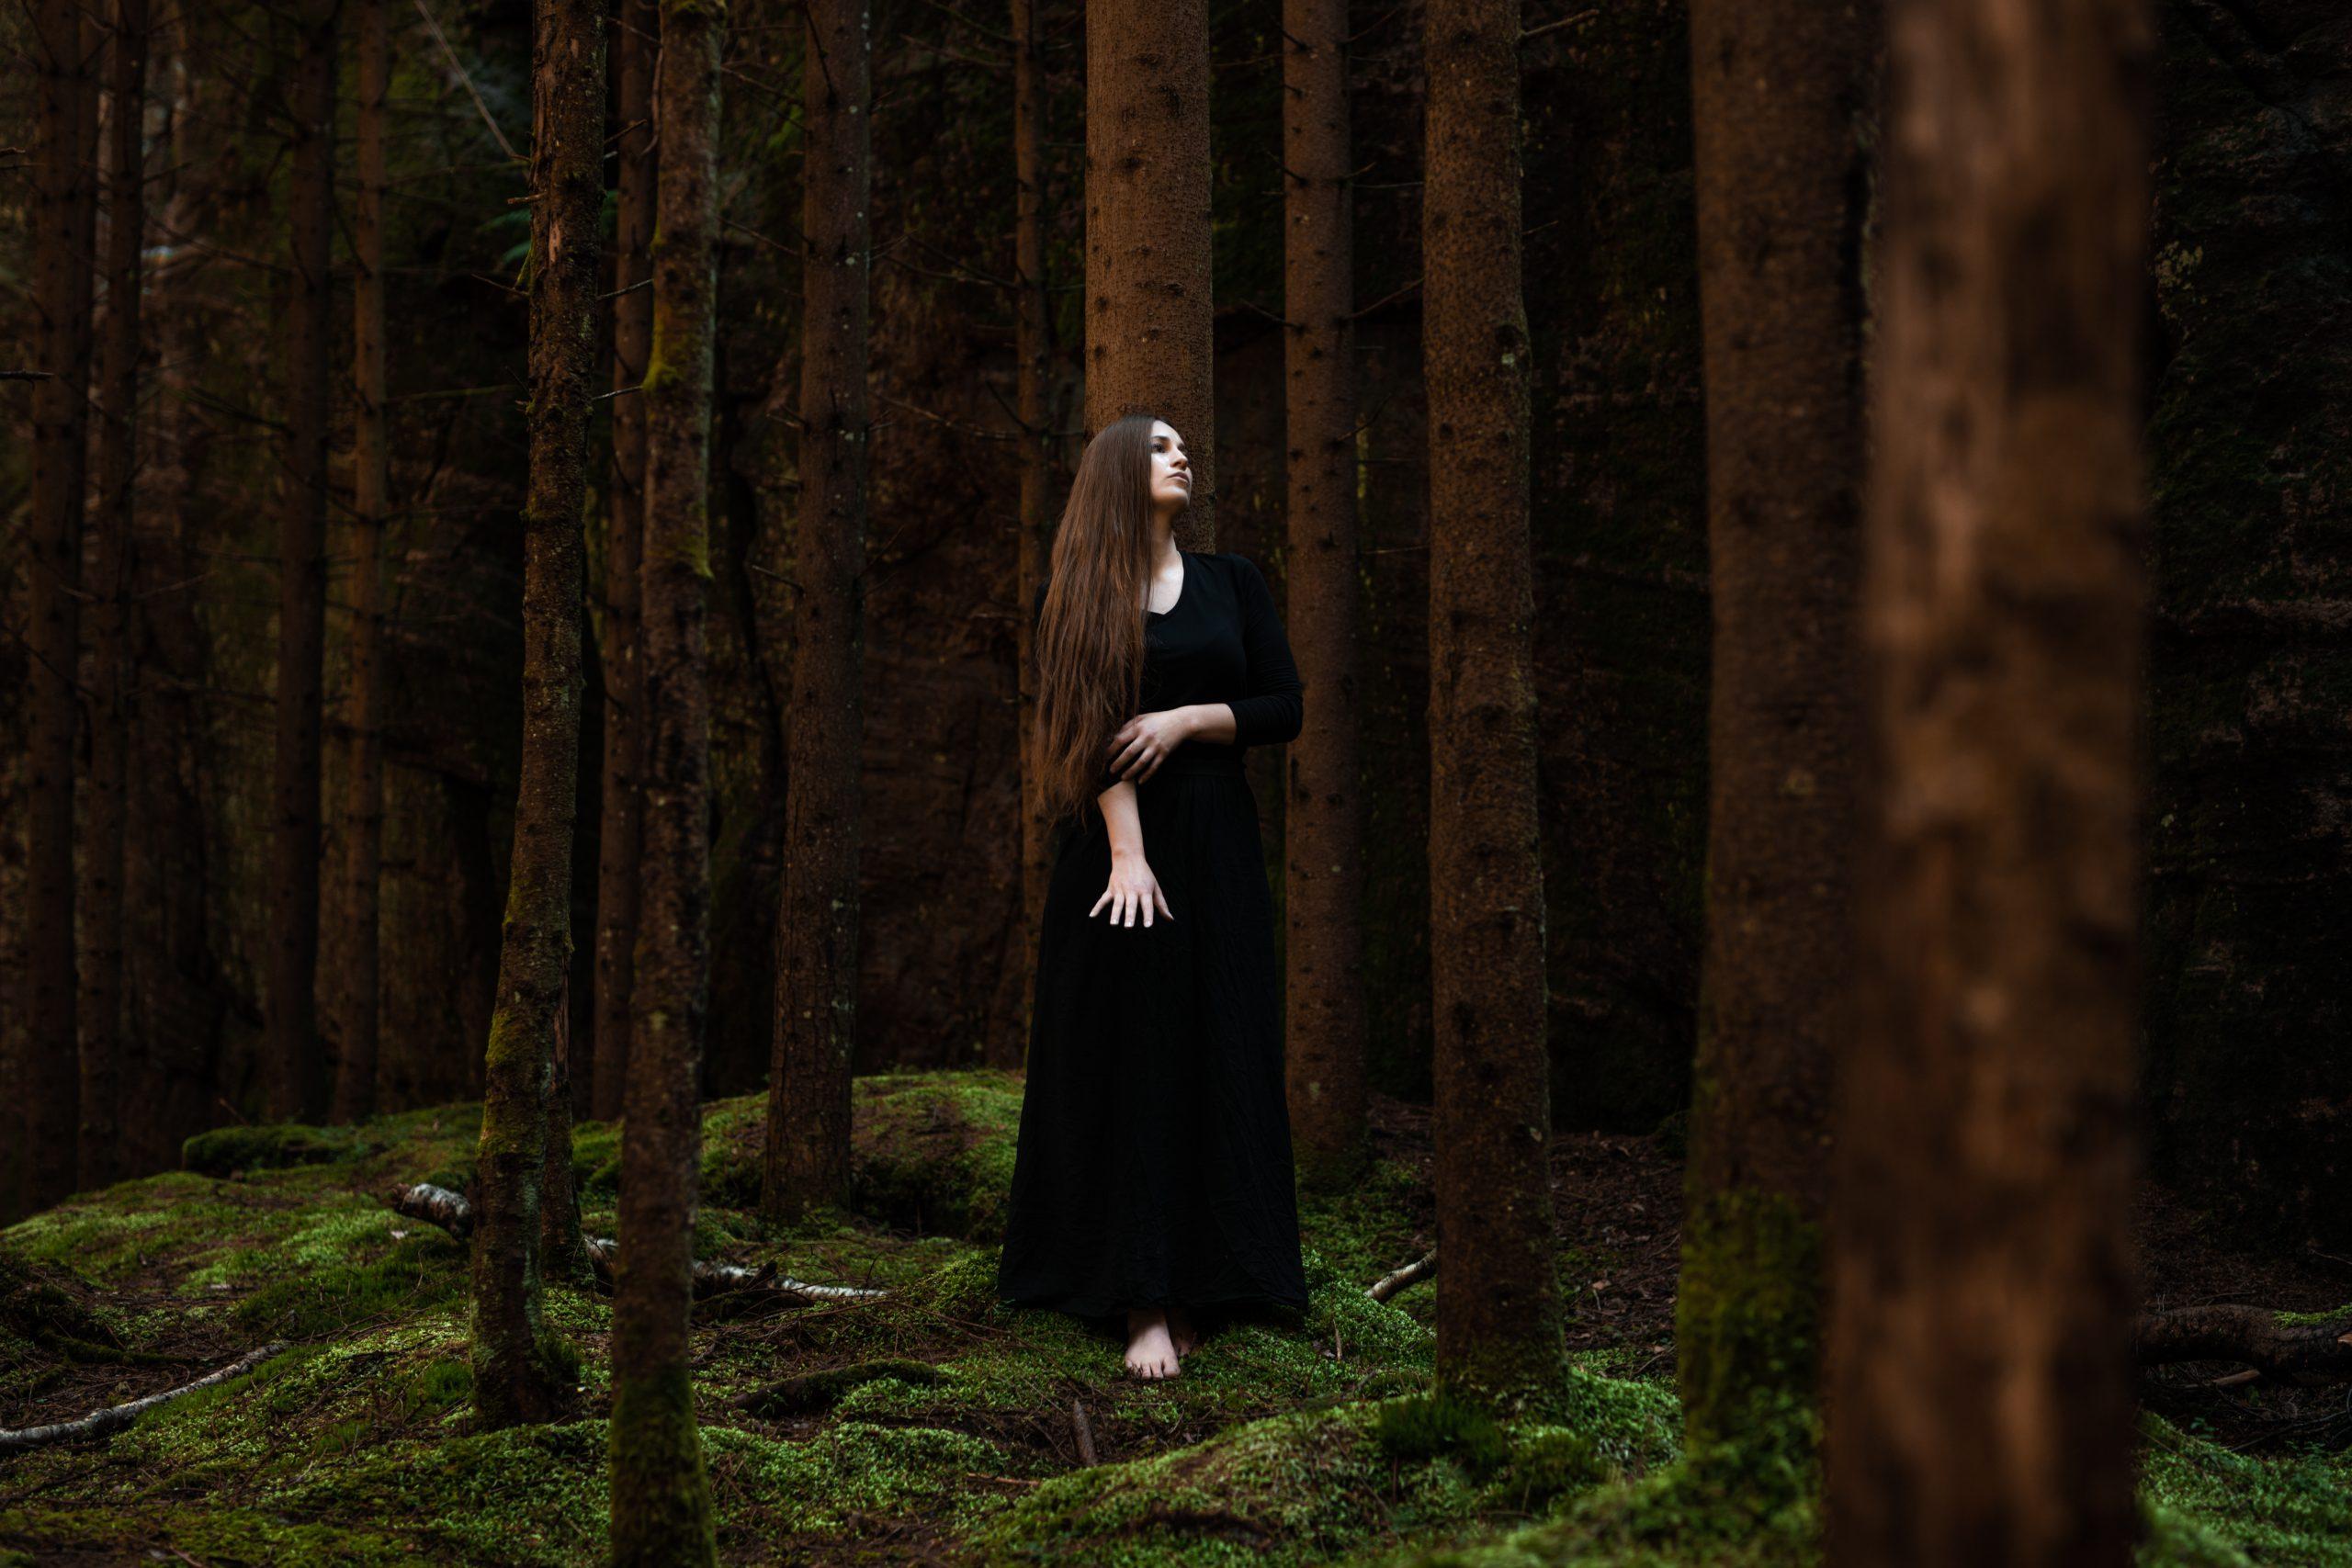 Trolsk skog